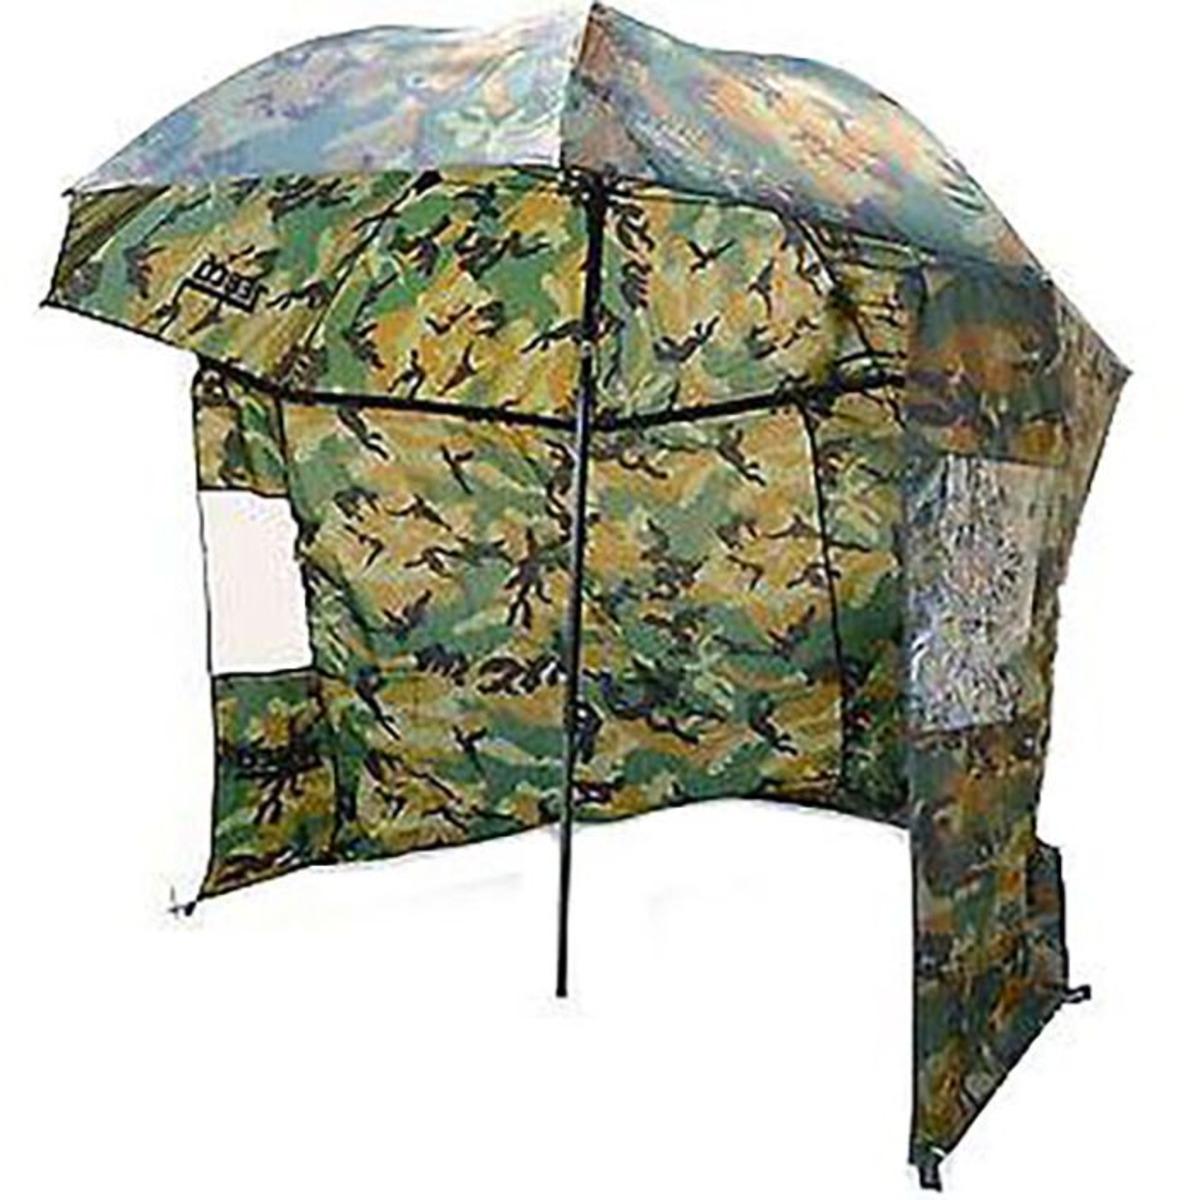 Zebco Nylon Camou Storm Umbrella - 2.20 m